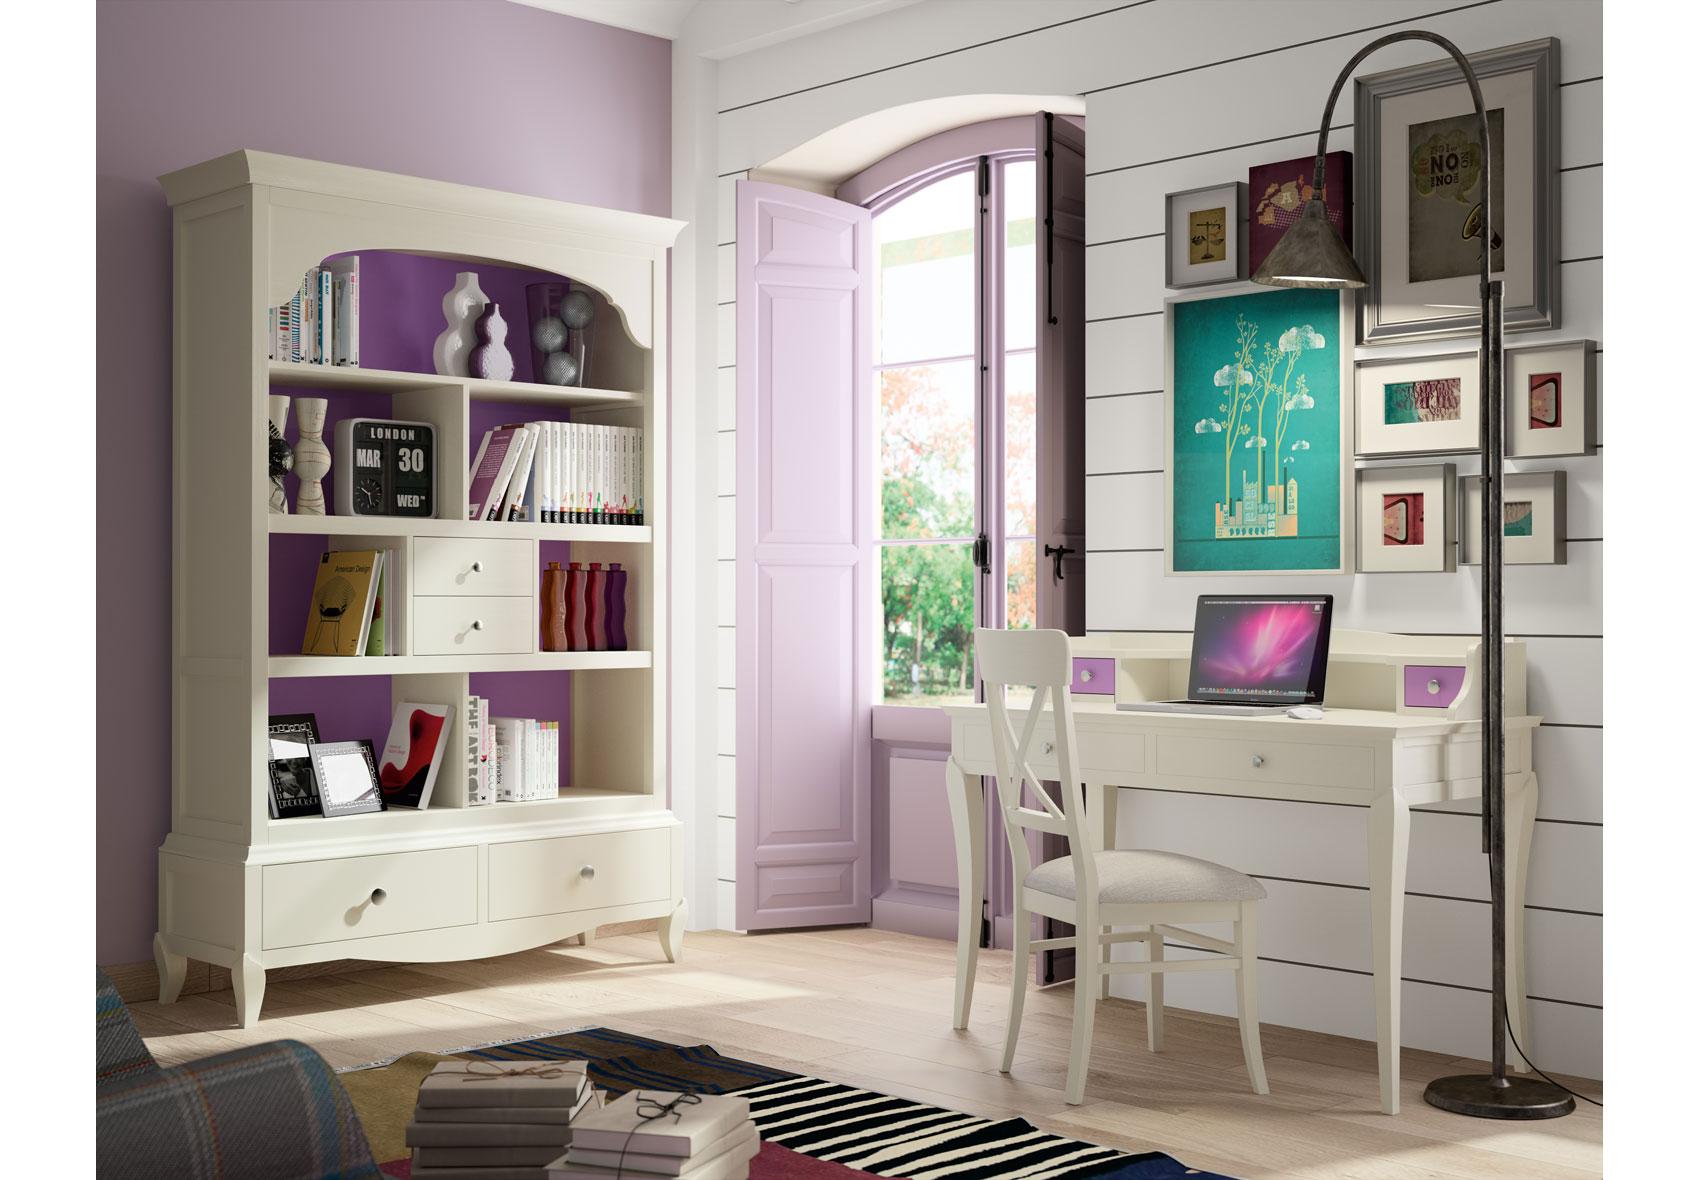 Muebles despacho trendy mobiliario with muebles despacho for Muebles para despacho